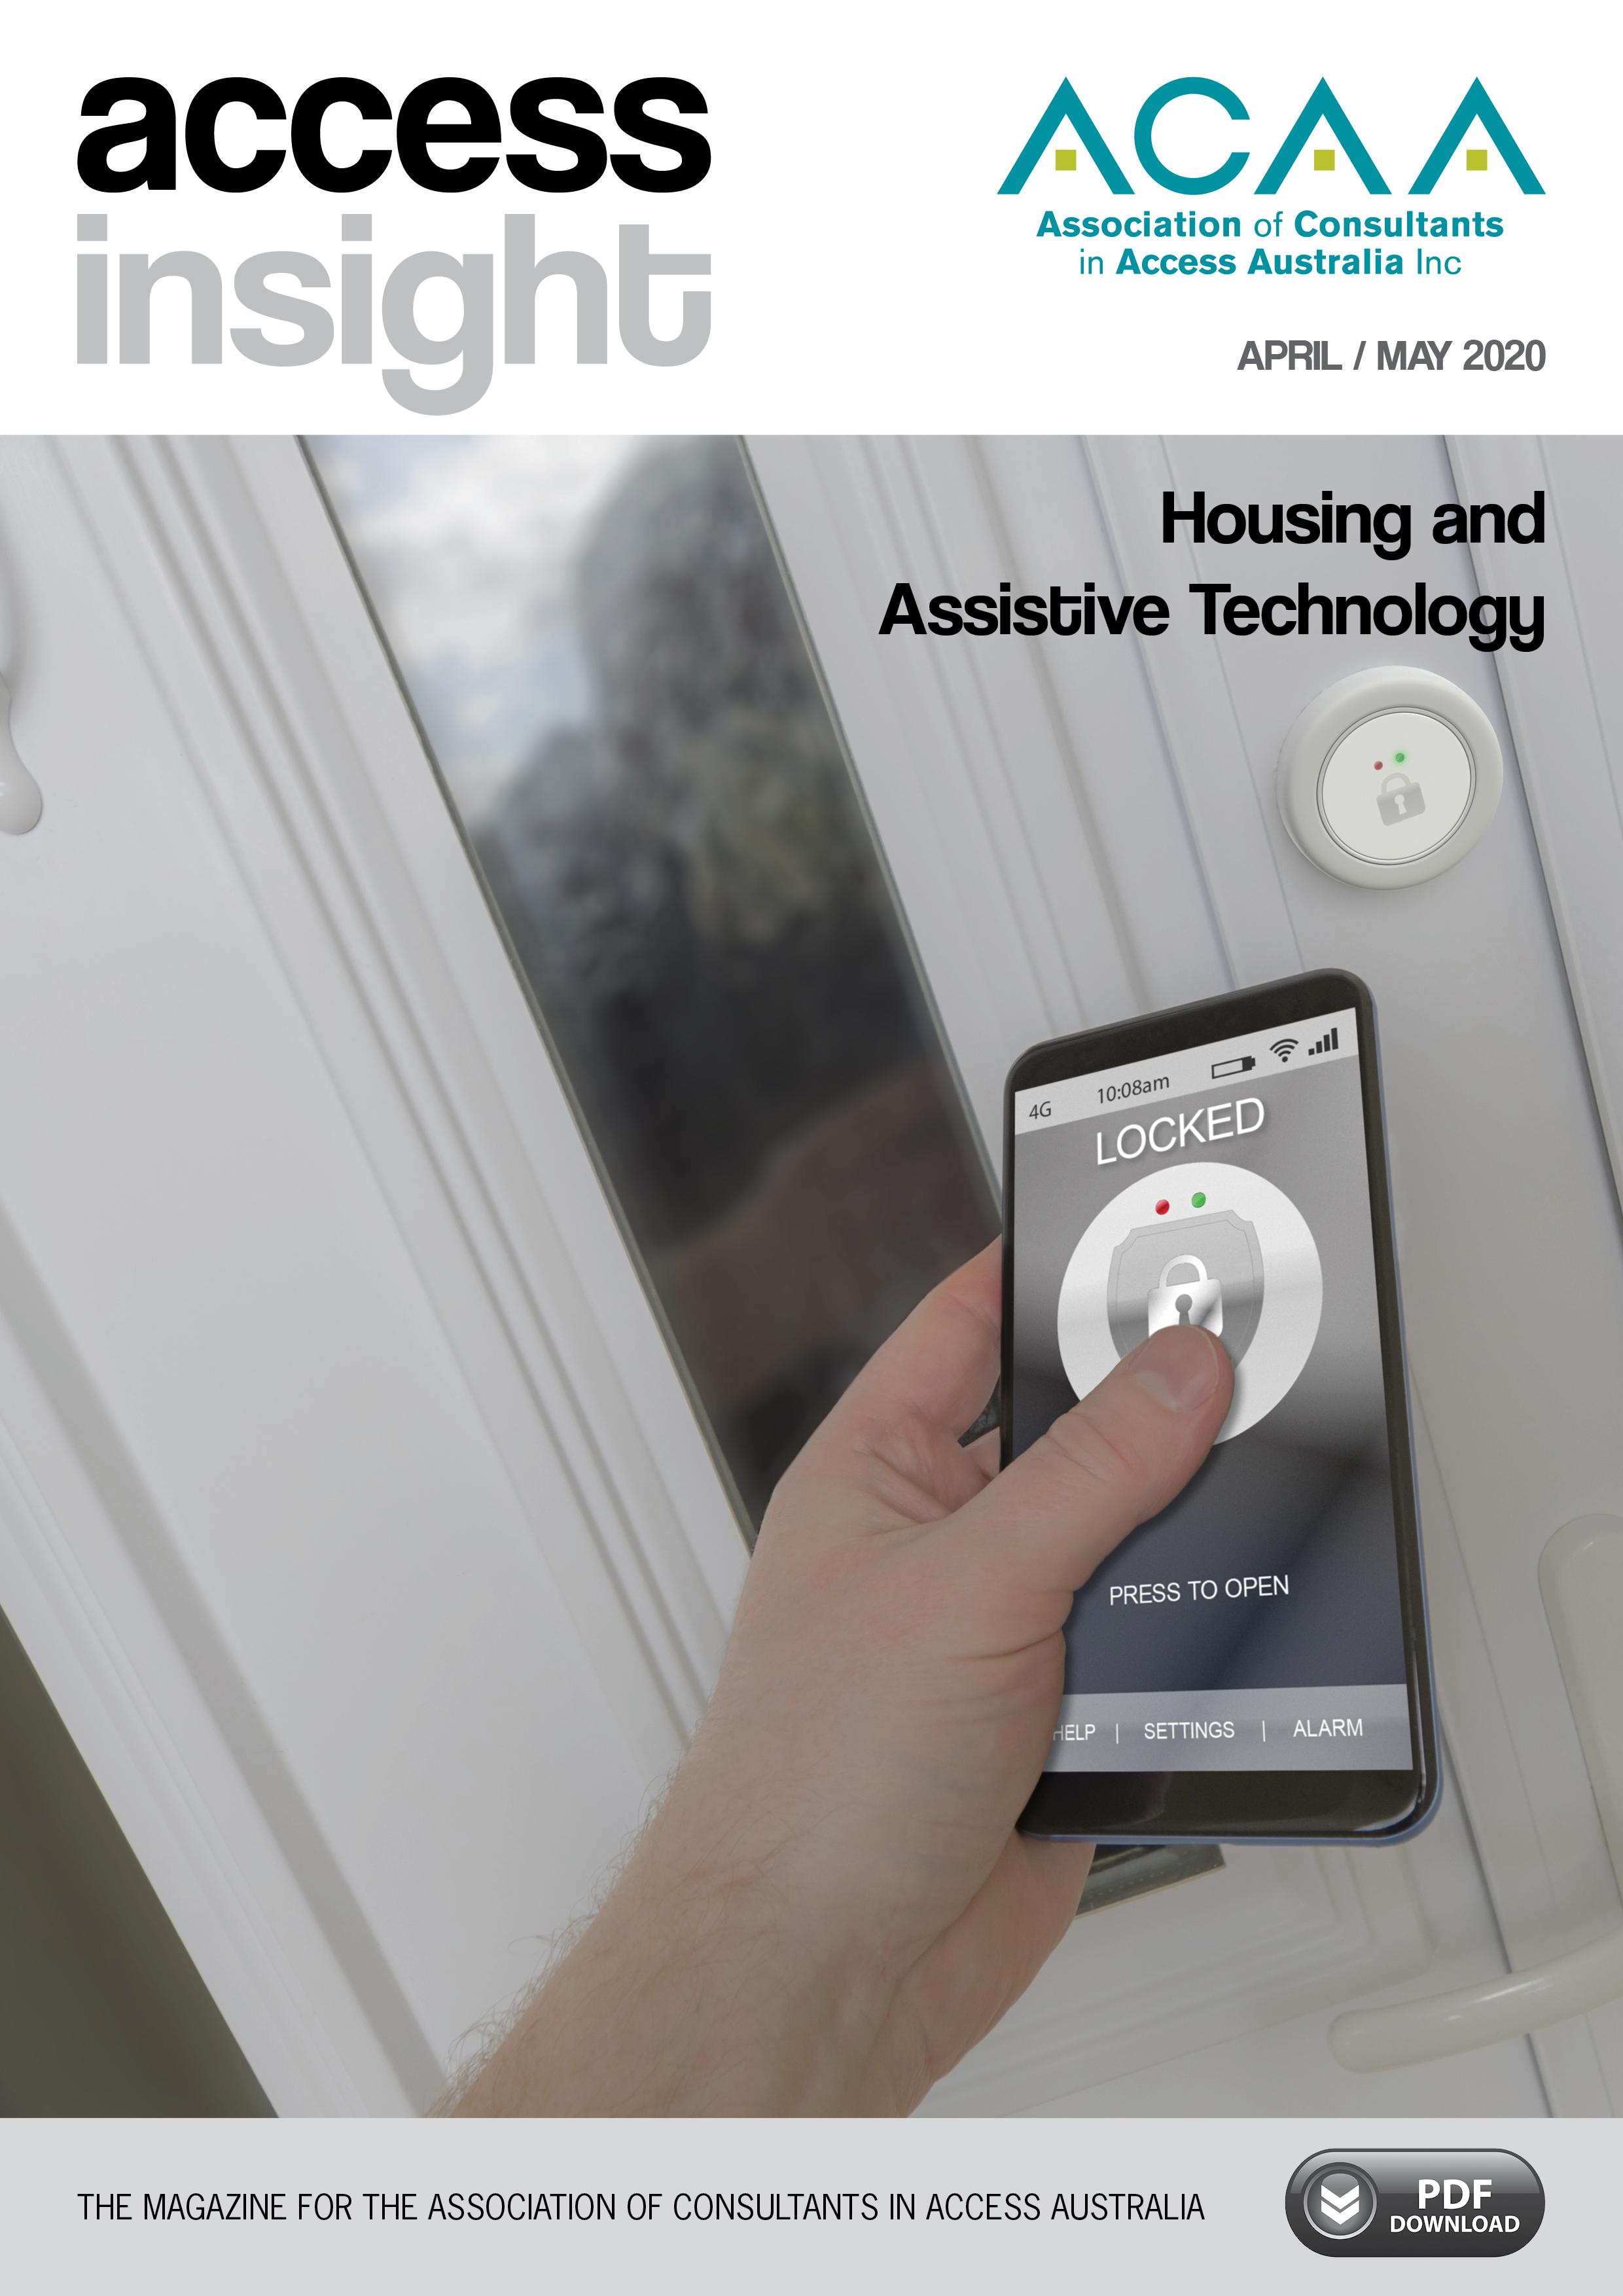 ACAA May2020Magazine COVER 002